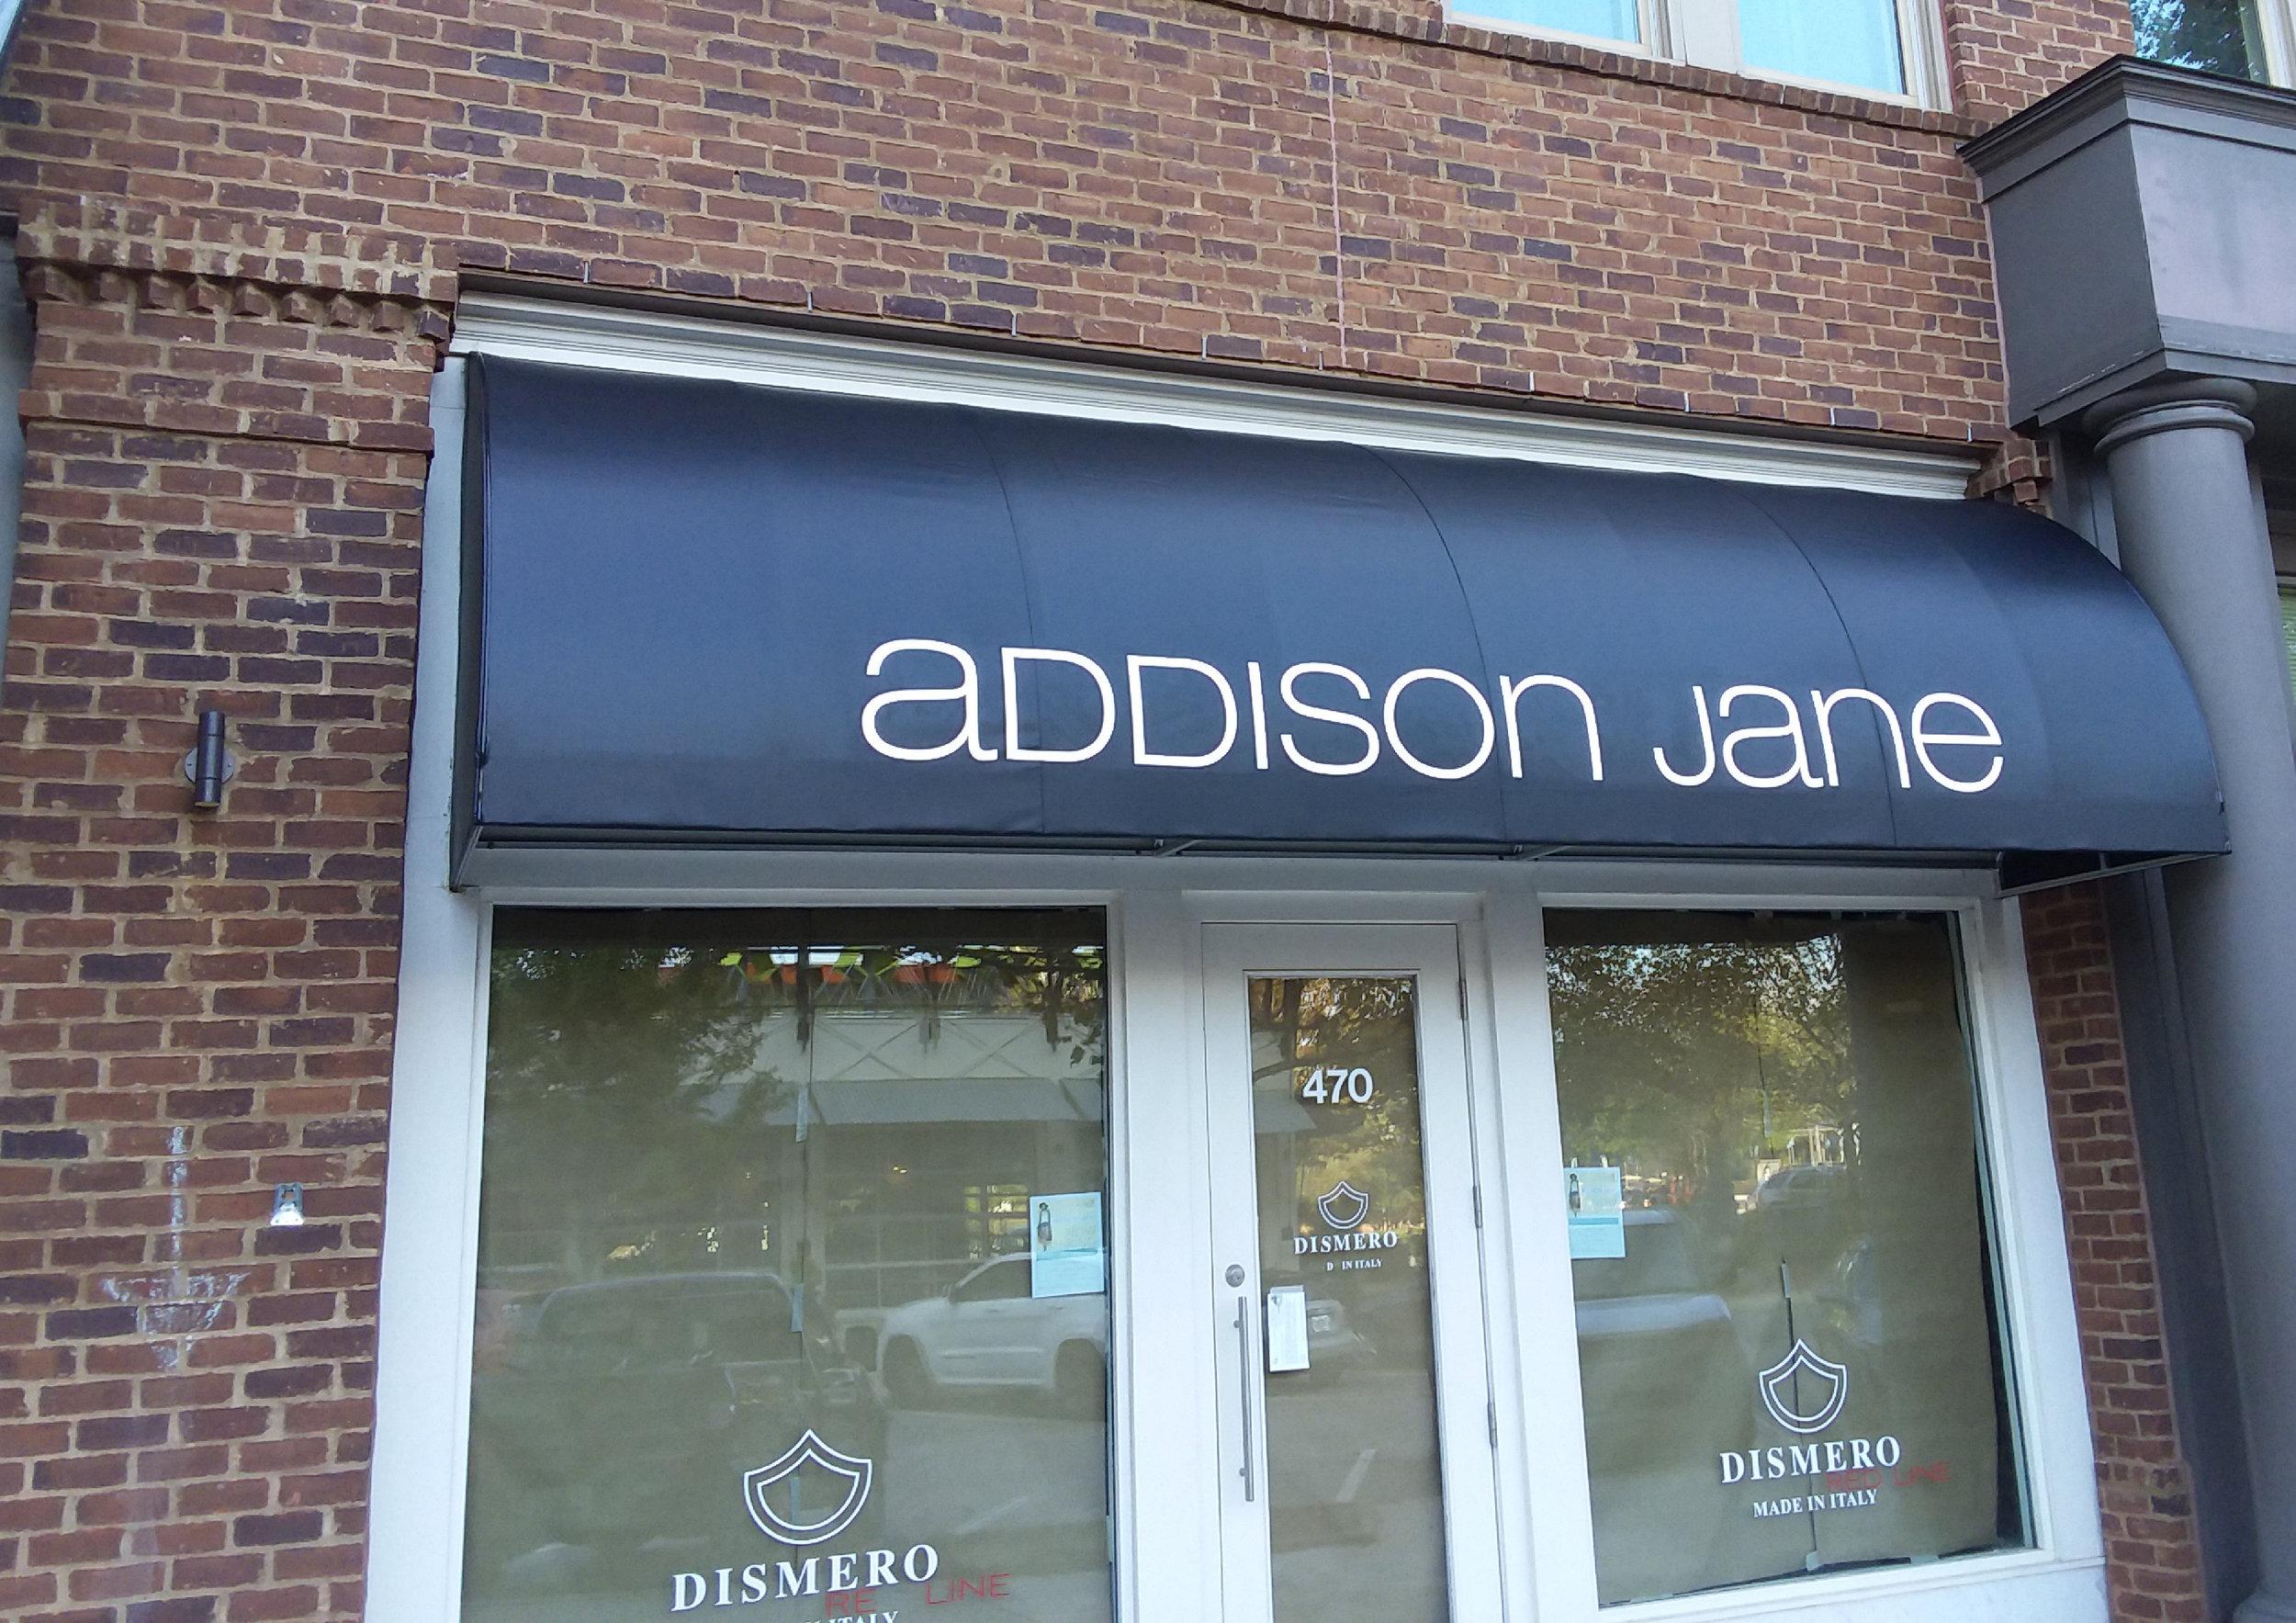 addison jane - awning.JPG